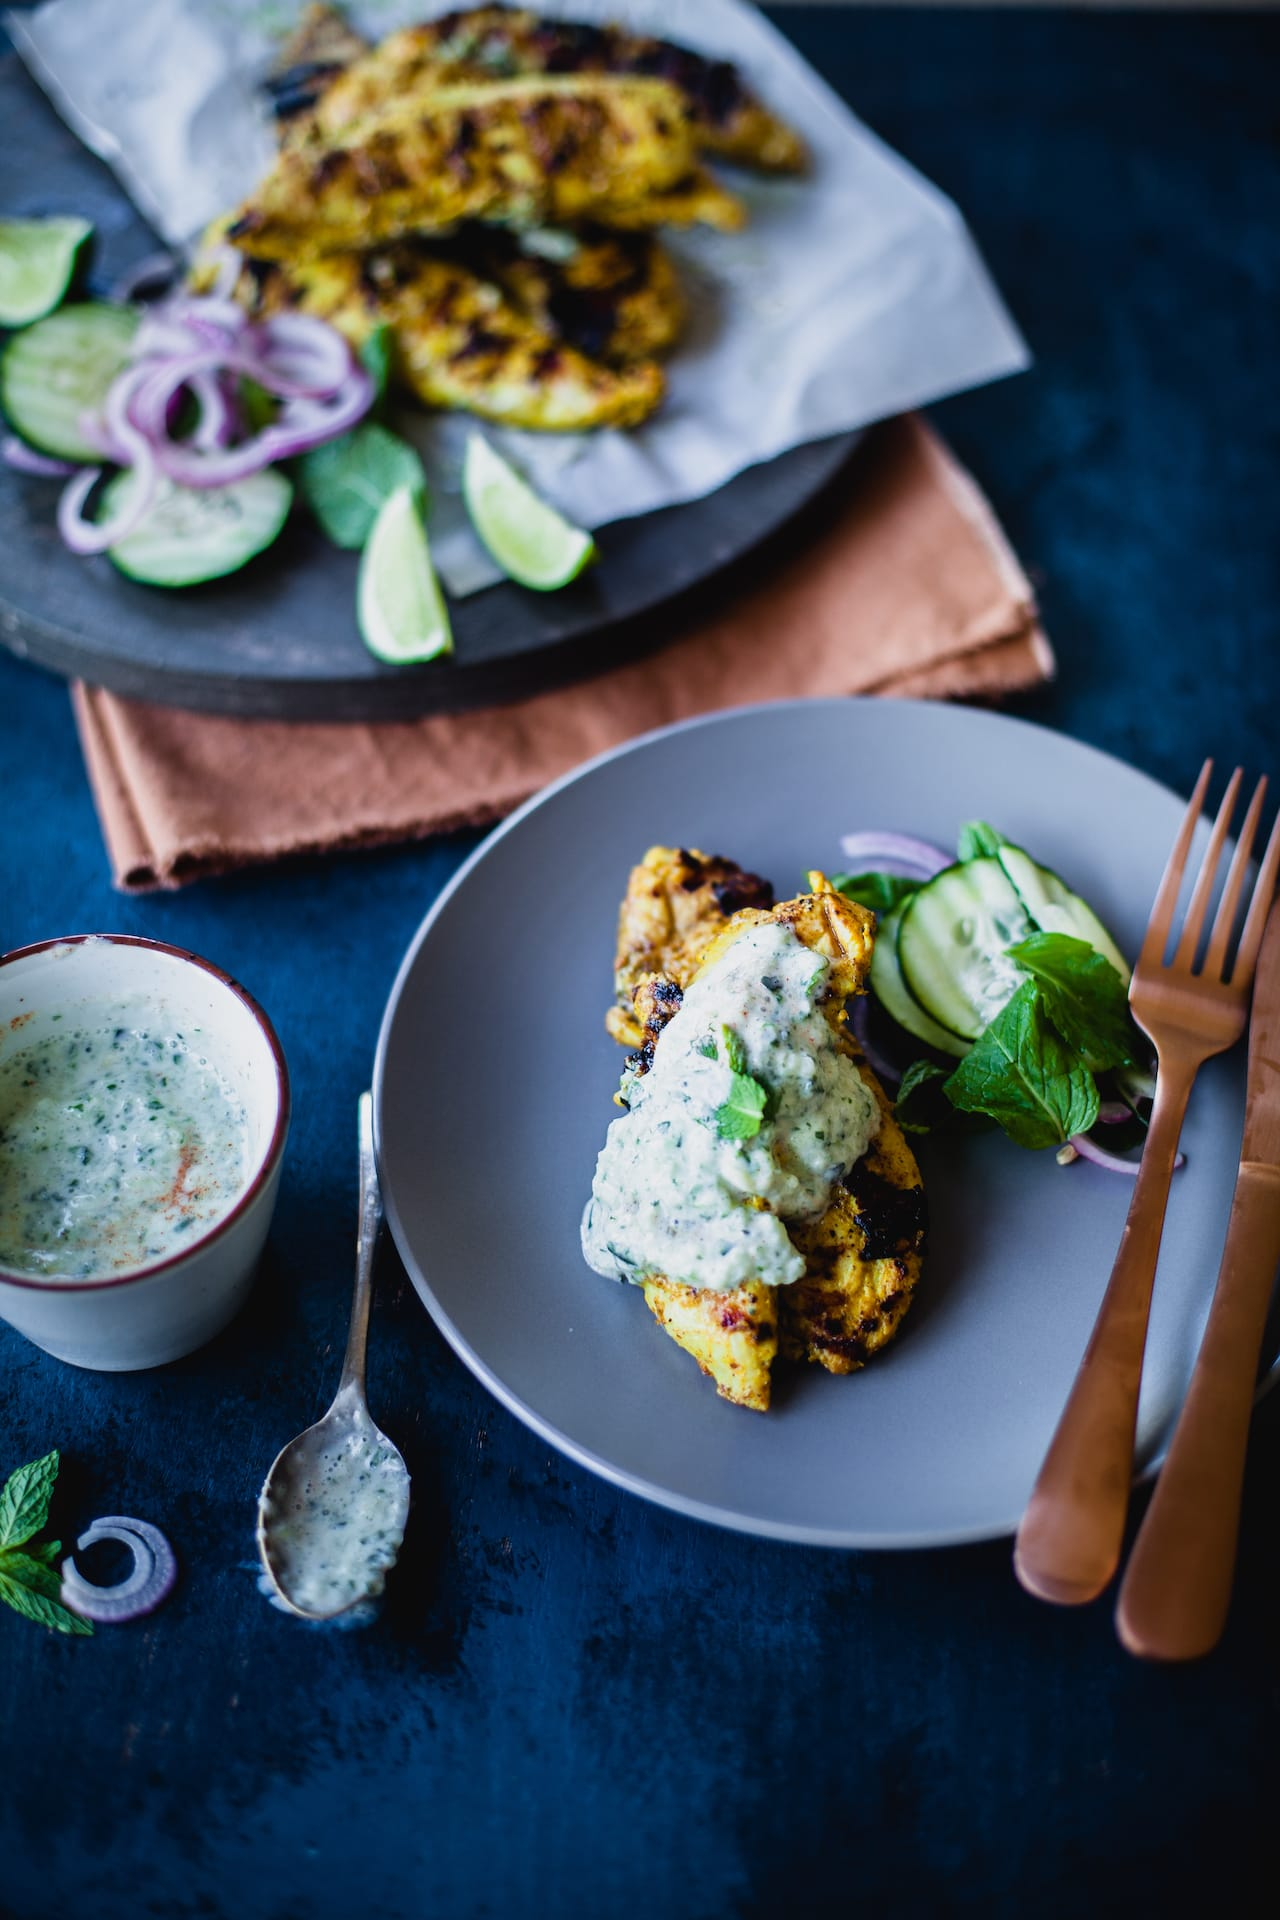 Garam Masala Grilled Chicken Tenders | Playful Cooking